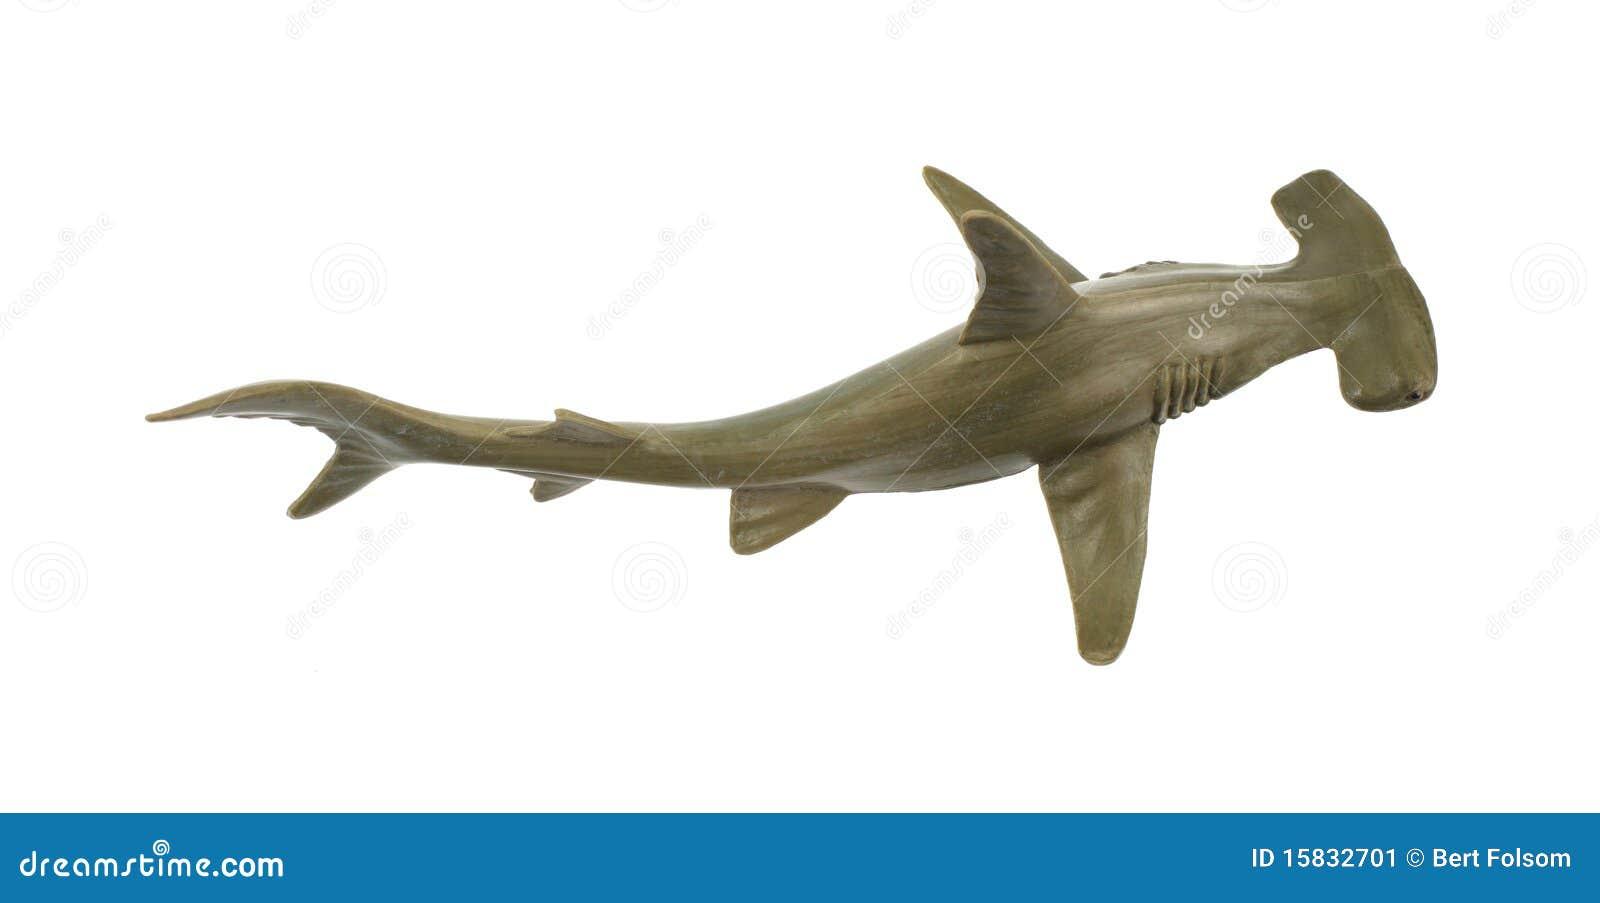 Toy hammerhead shark